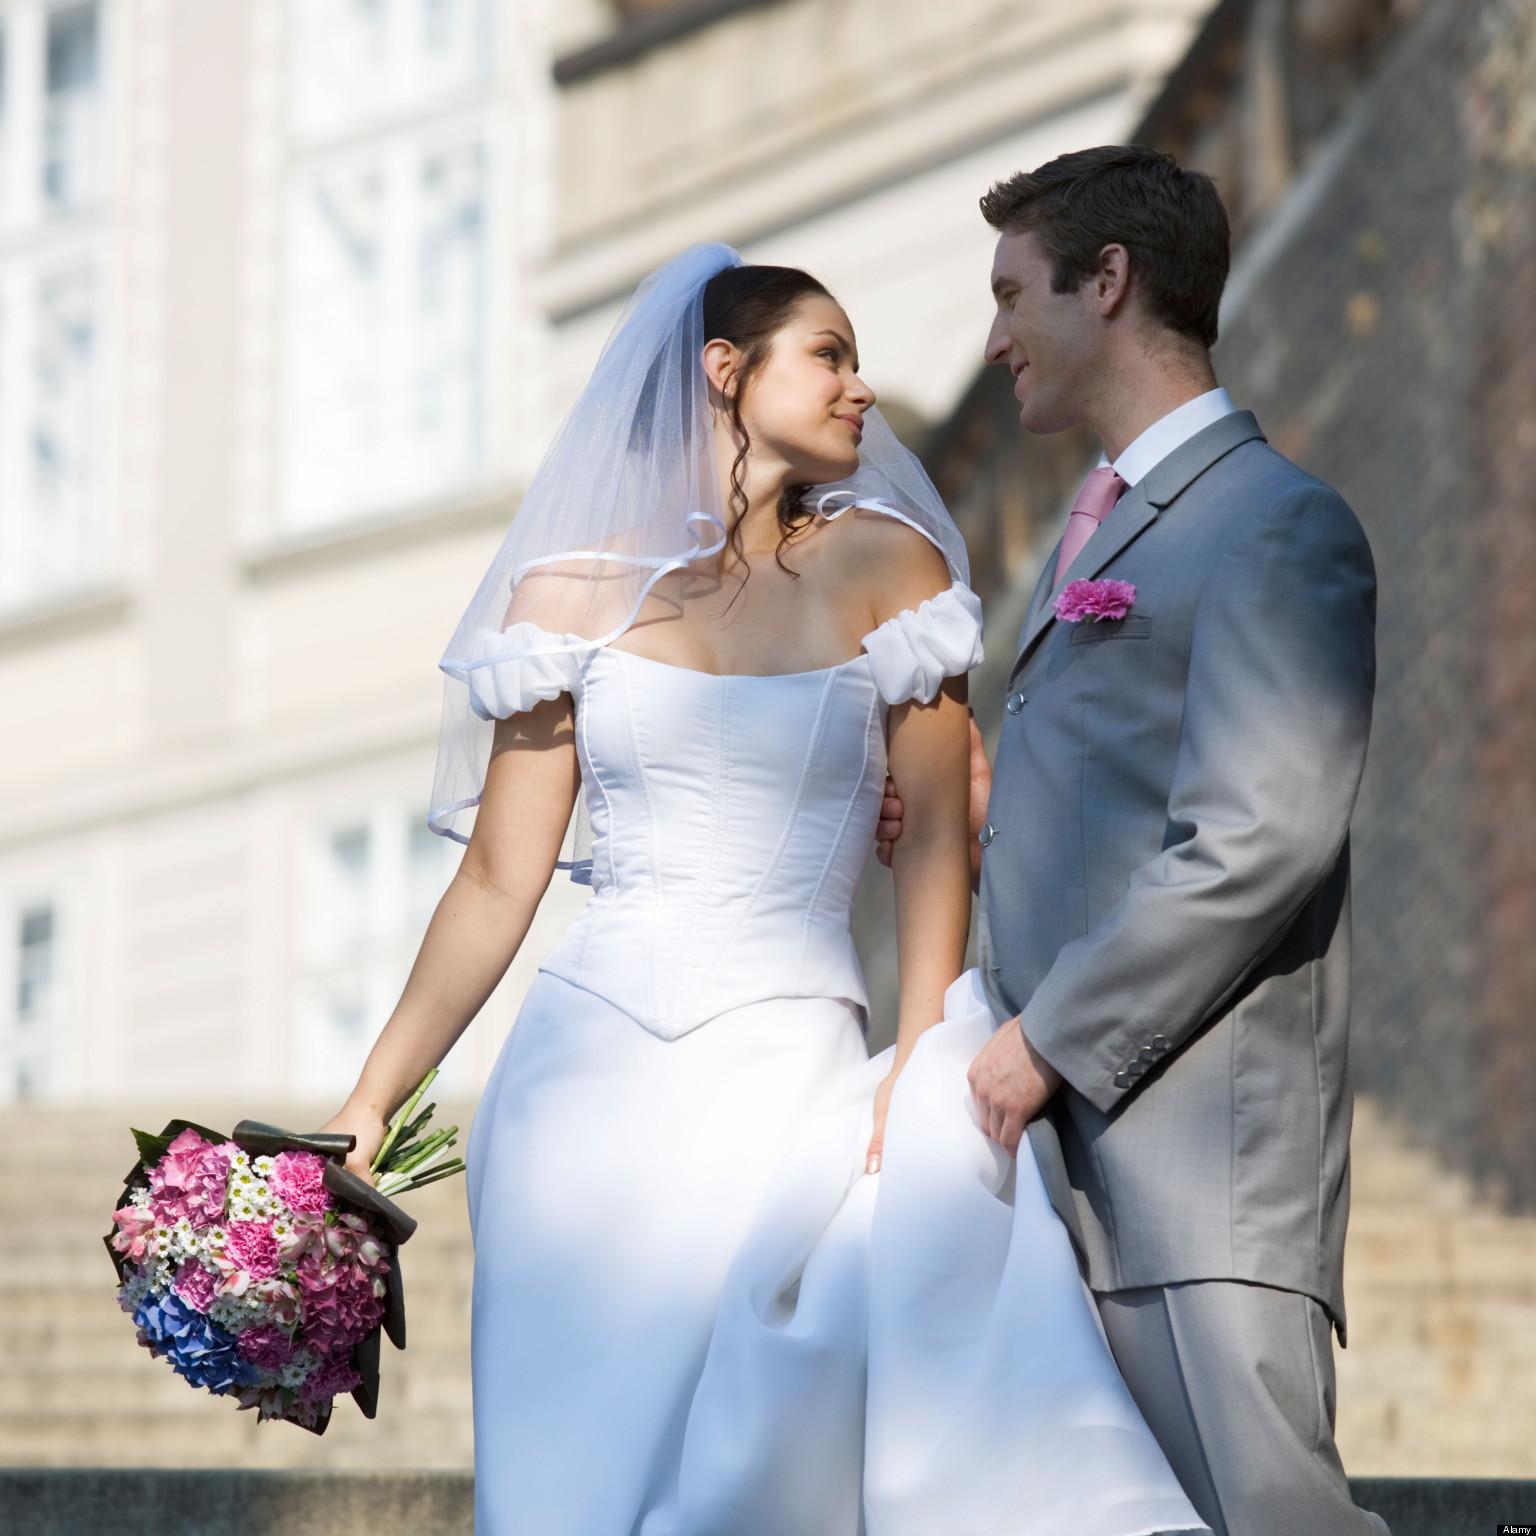 Celebrity Wedding Etiquette: Wedding Etiquette: Dilemmas In The 21st Century